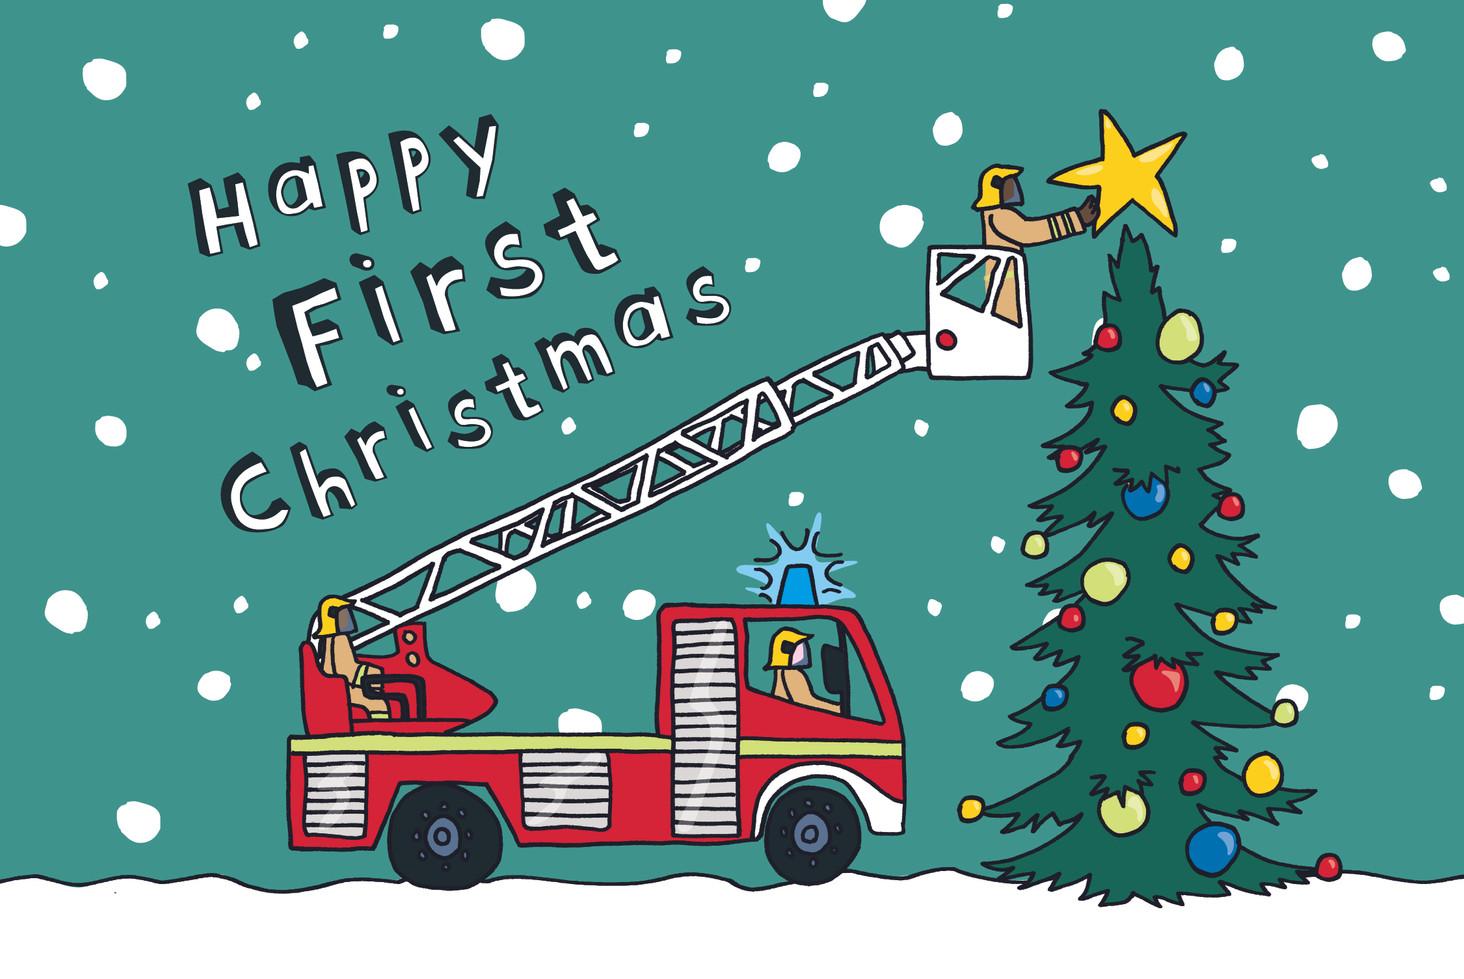 Christmas Fire Engine - First Christmas